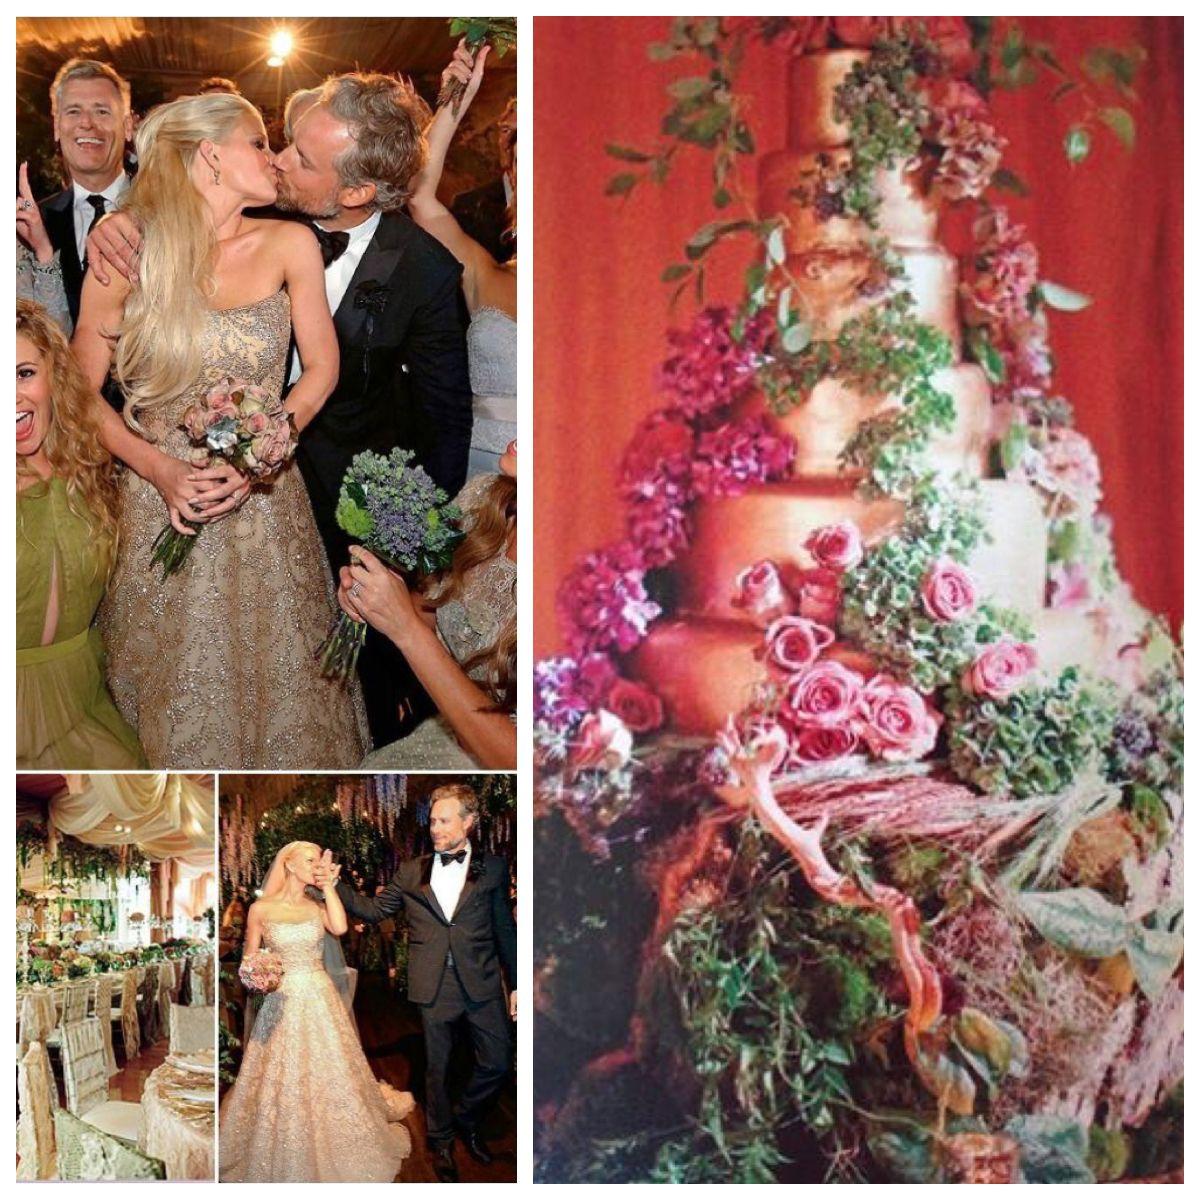 Jessica Simpson And Eric Johnson Wedding Cake Jessica Simpson Wedding Celebrity Wedding Dresses Celebrity Bride